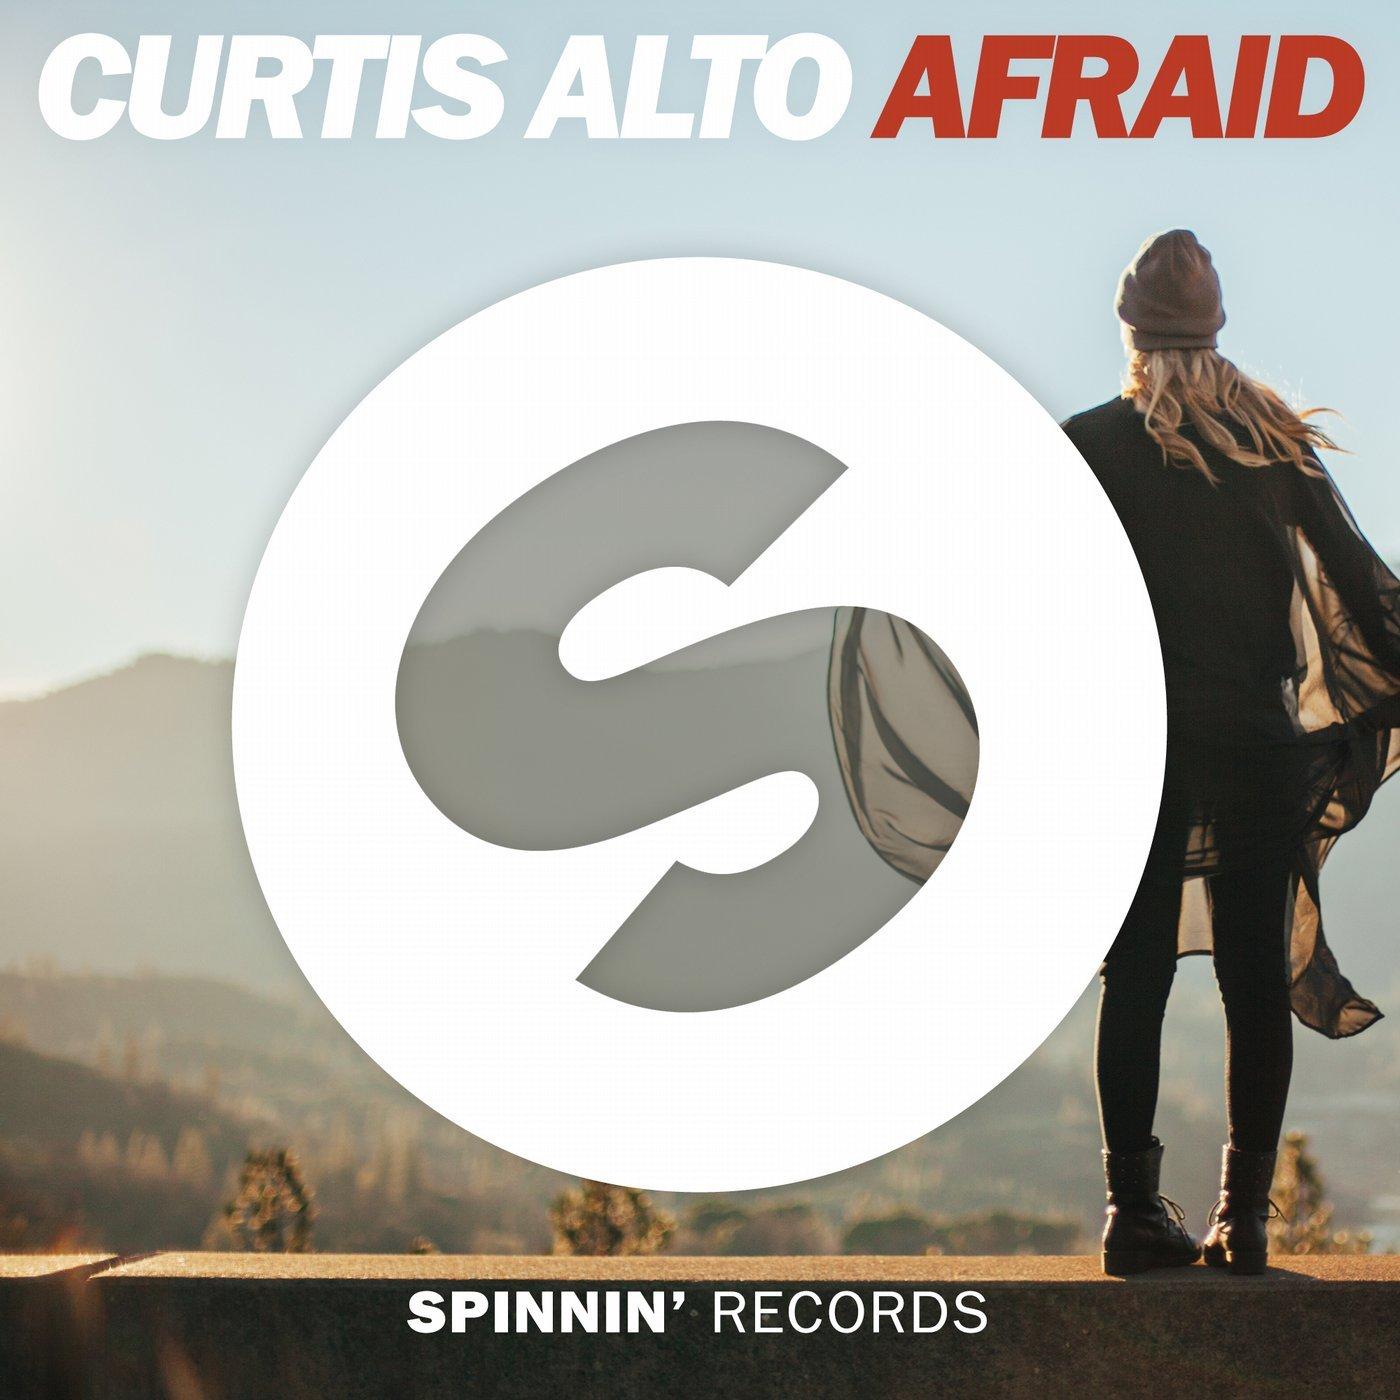 Curtis alto afraid extended mix